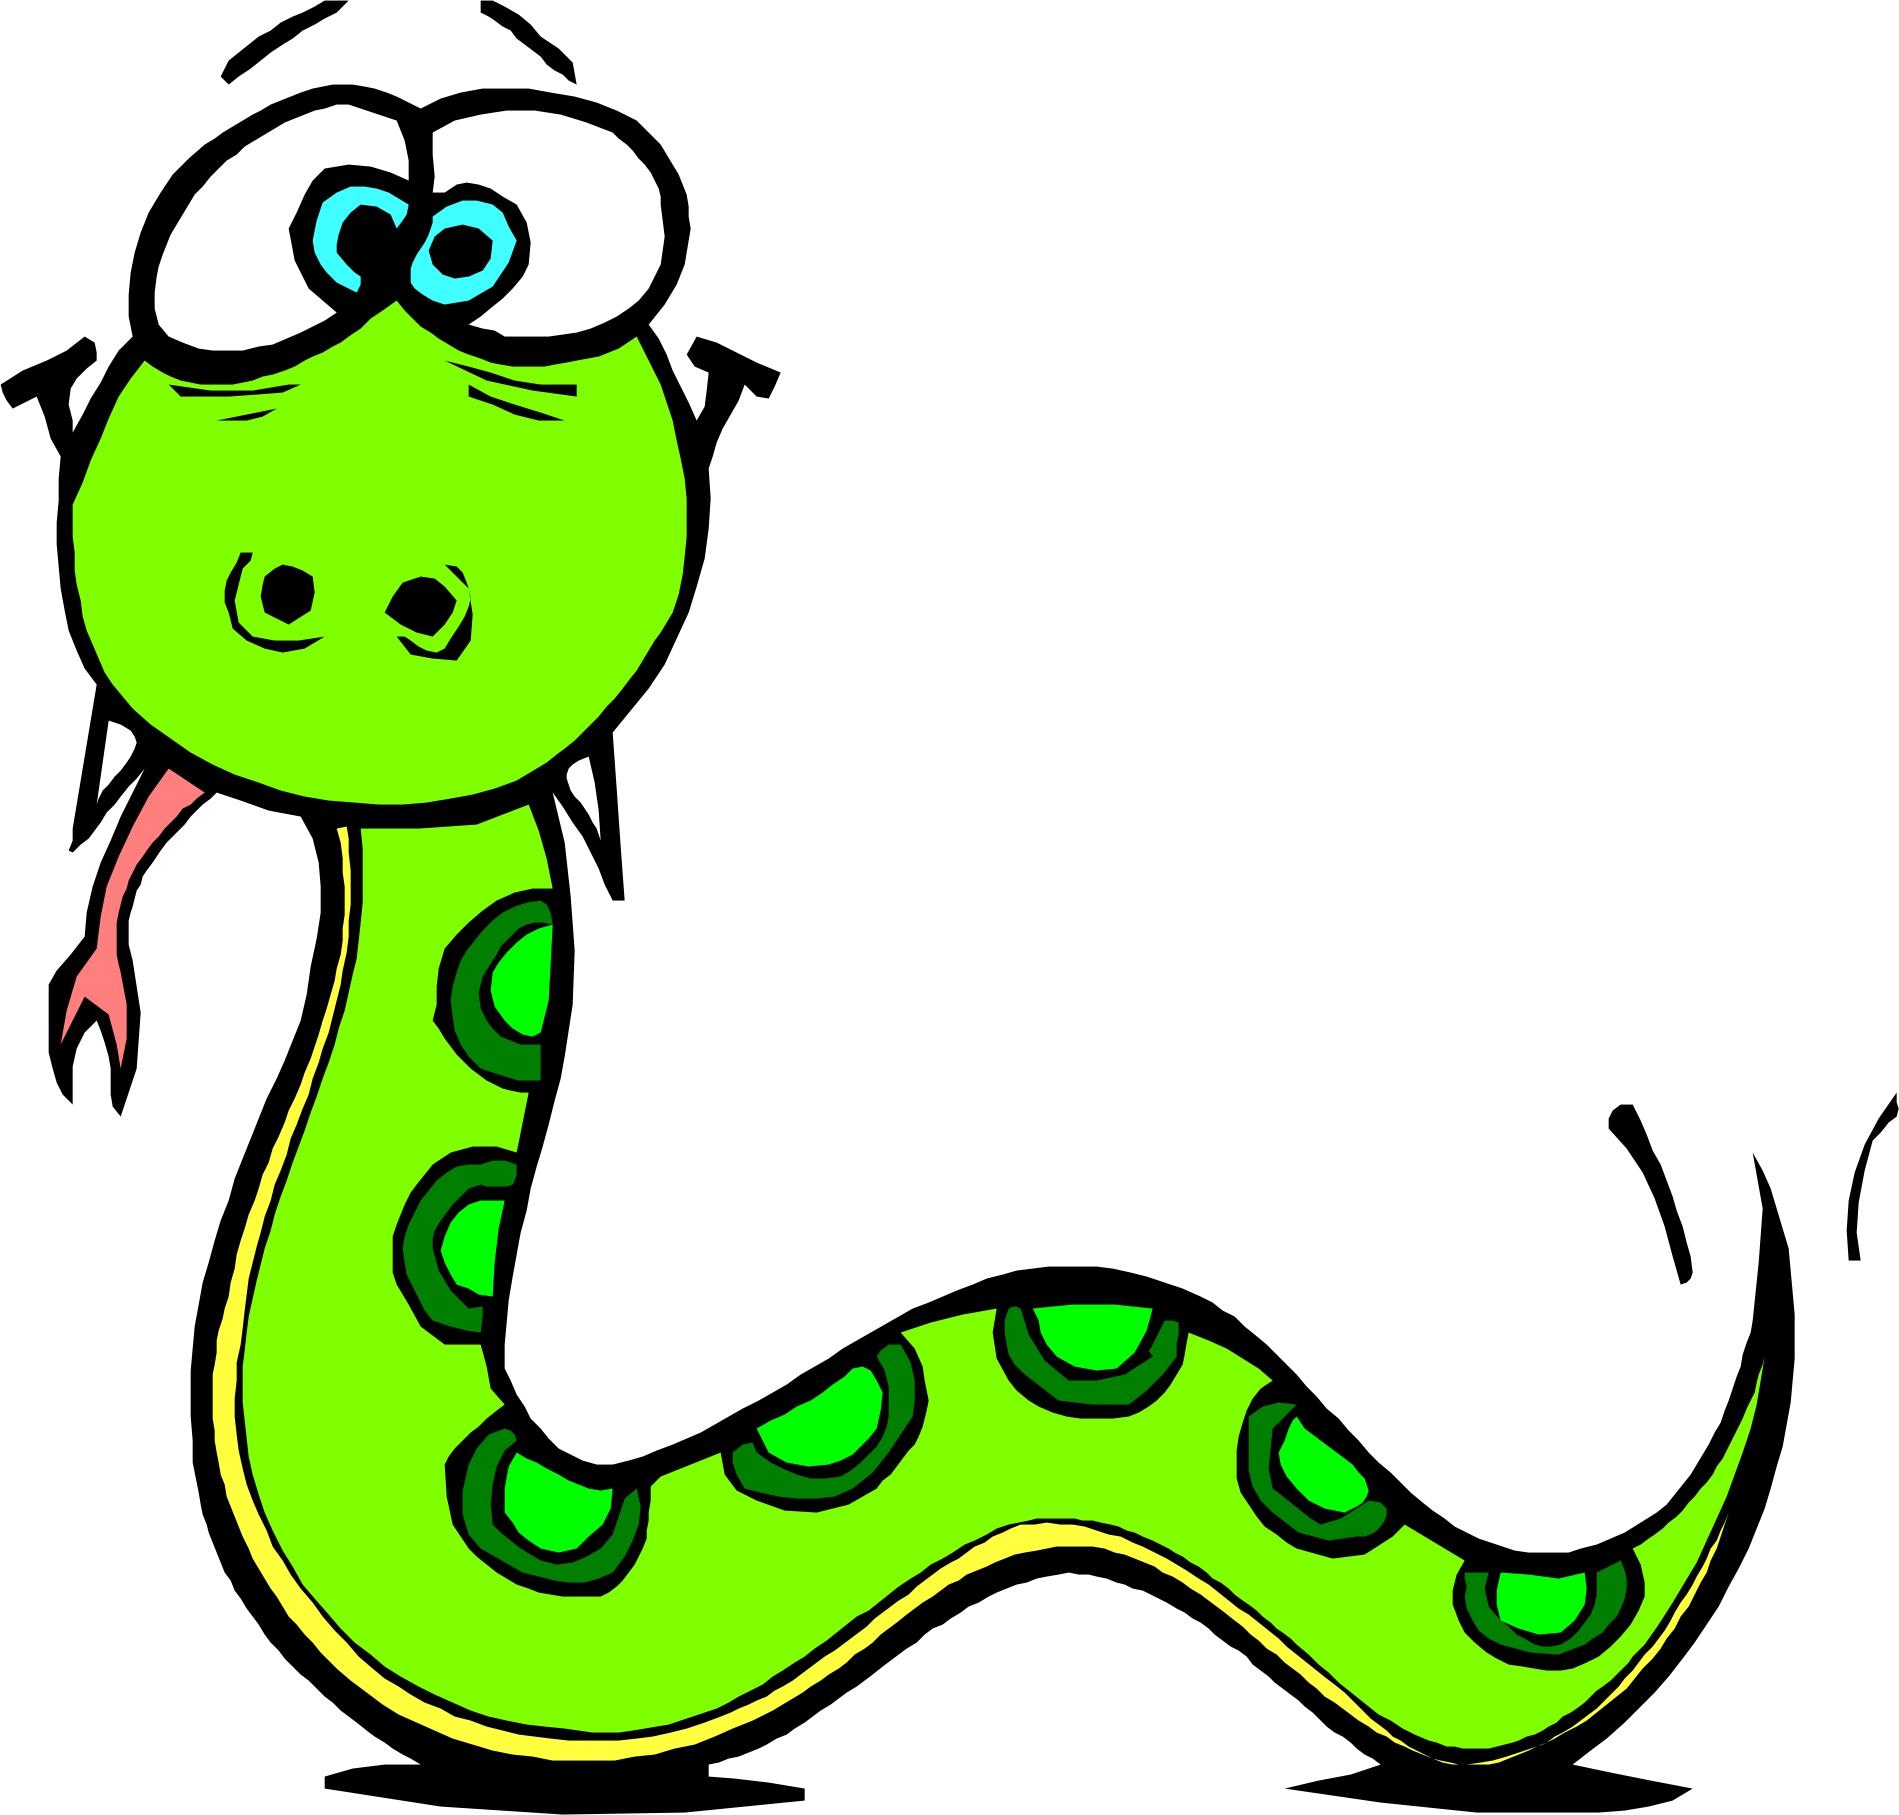 Cartoon Snakes - Cliparts.co